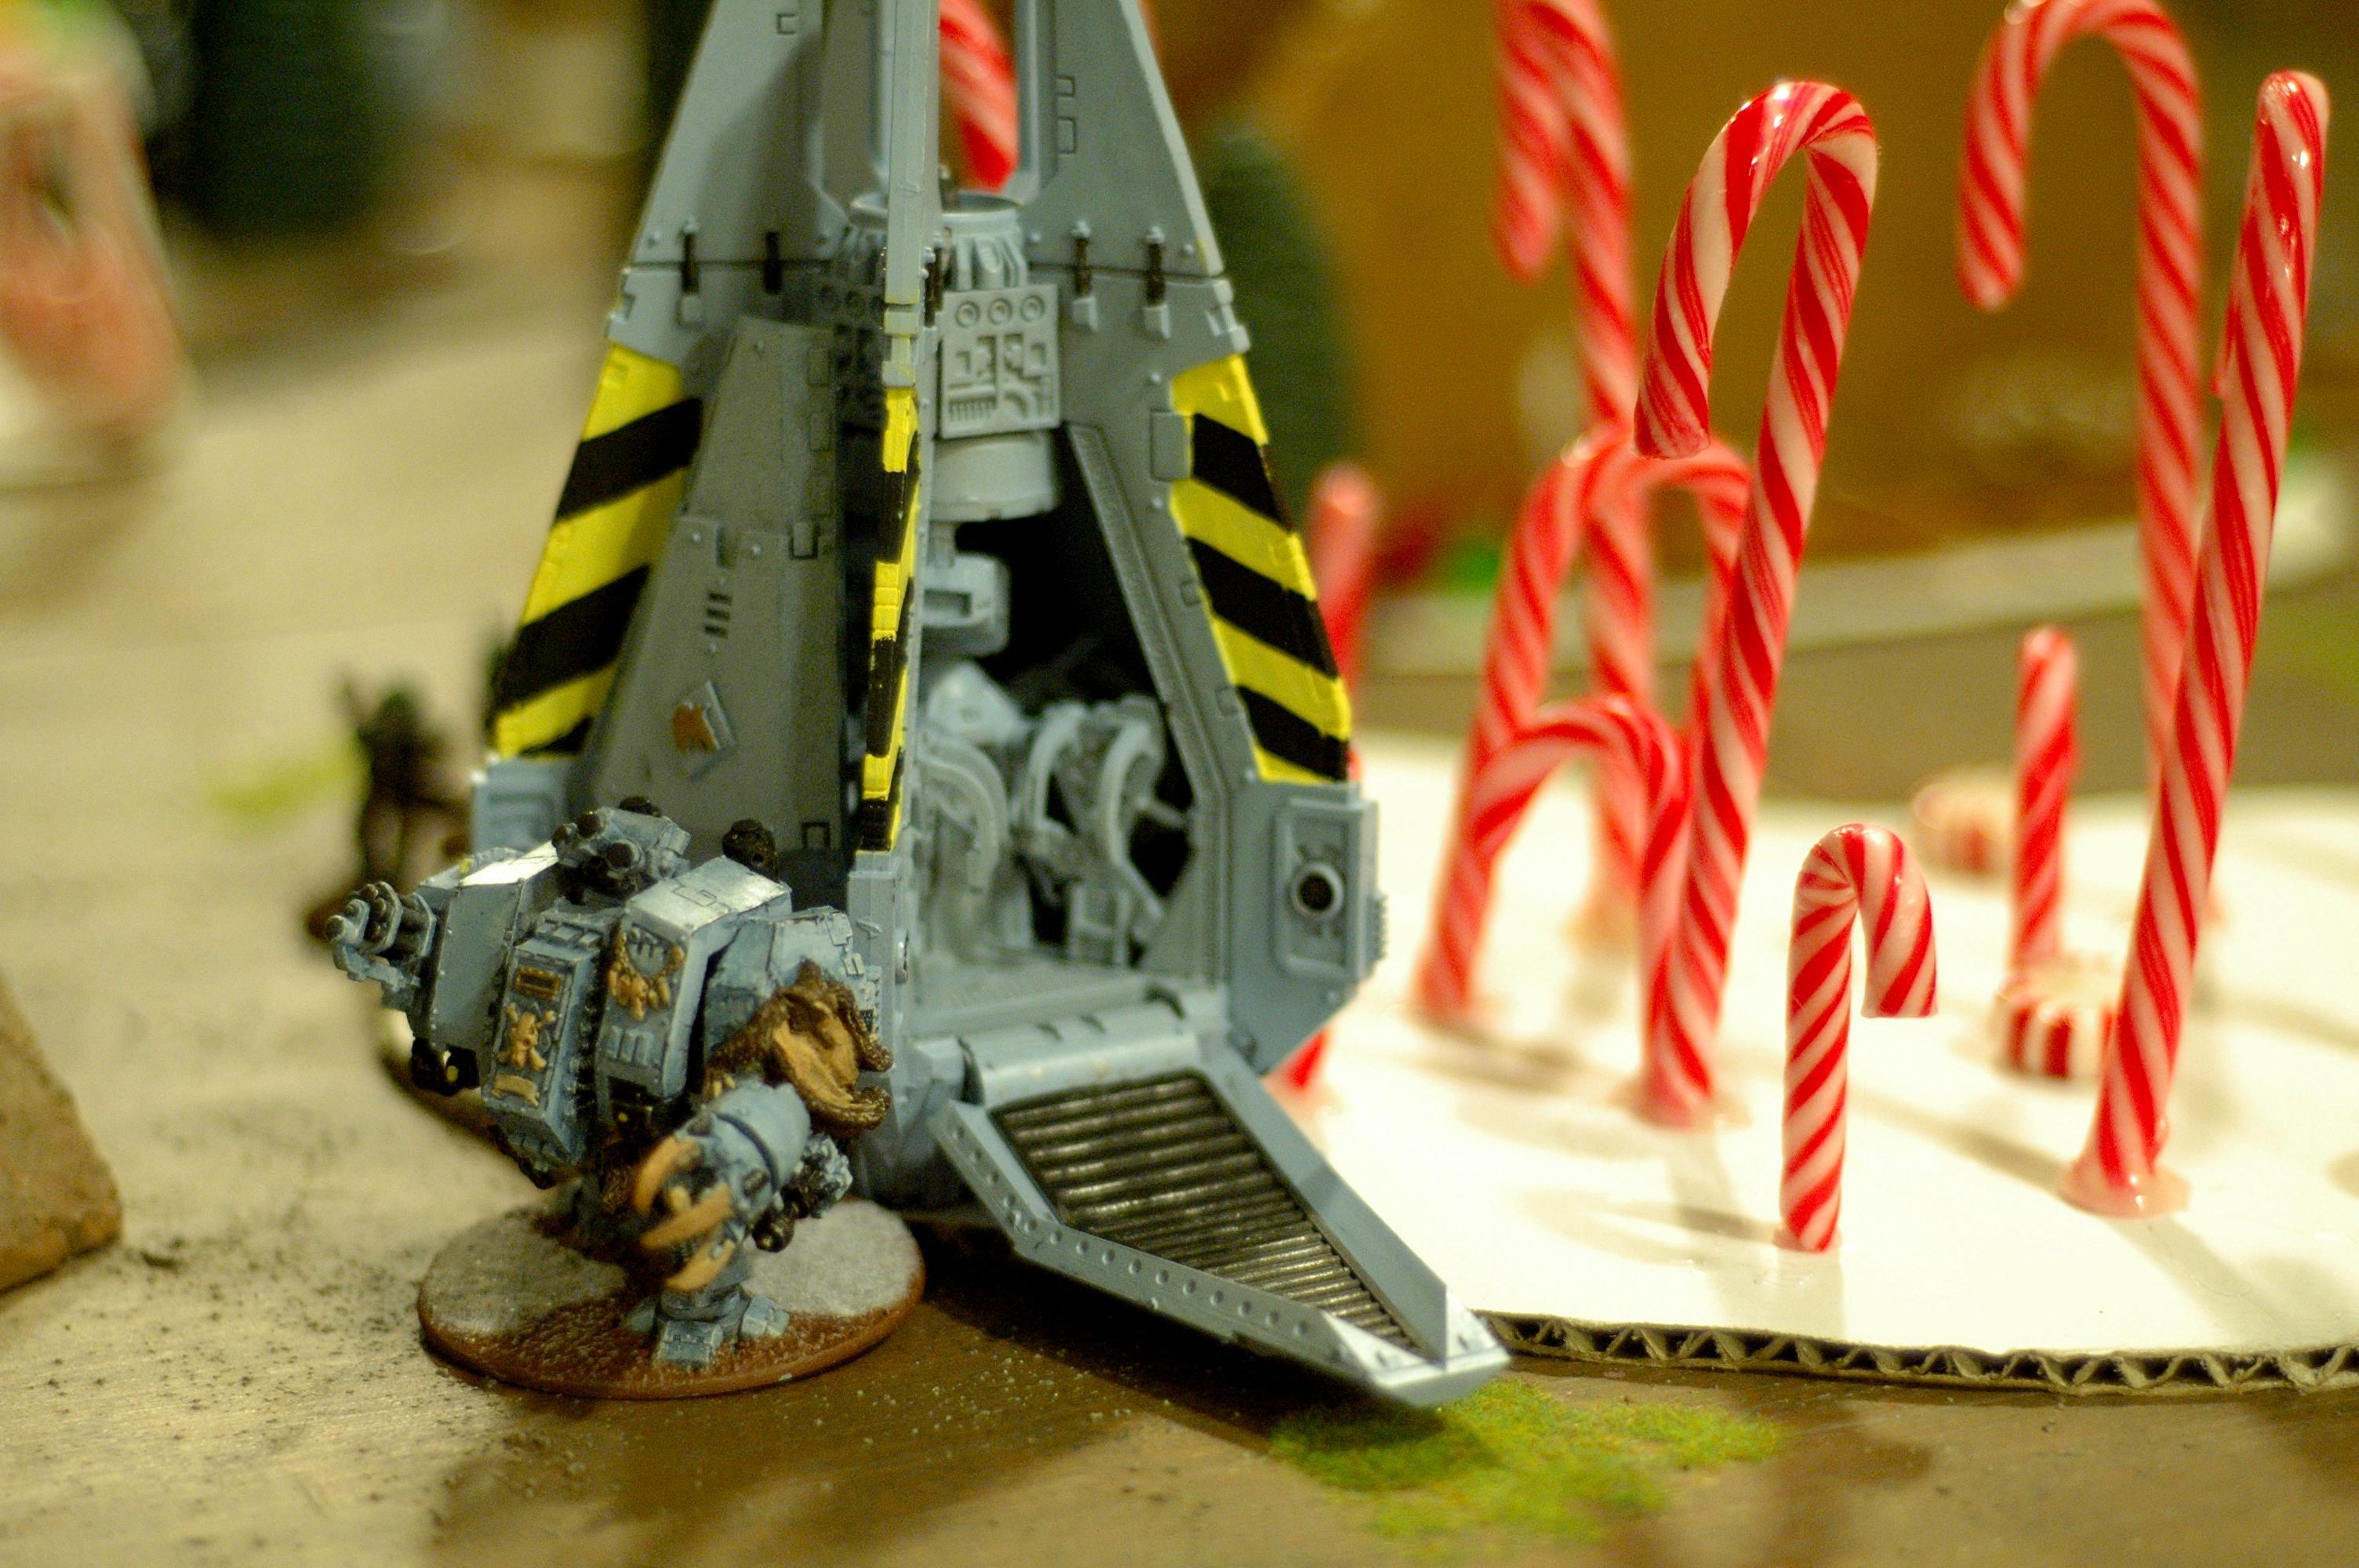 Battle Report, Buildings, Christmas, Game Table, Terrain